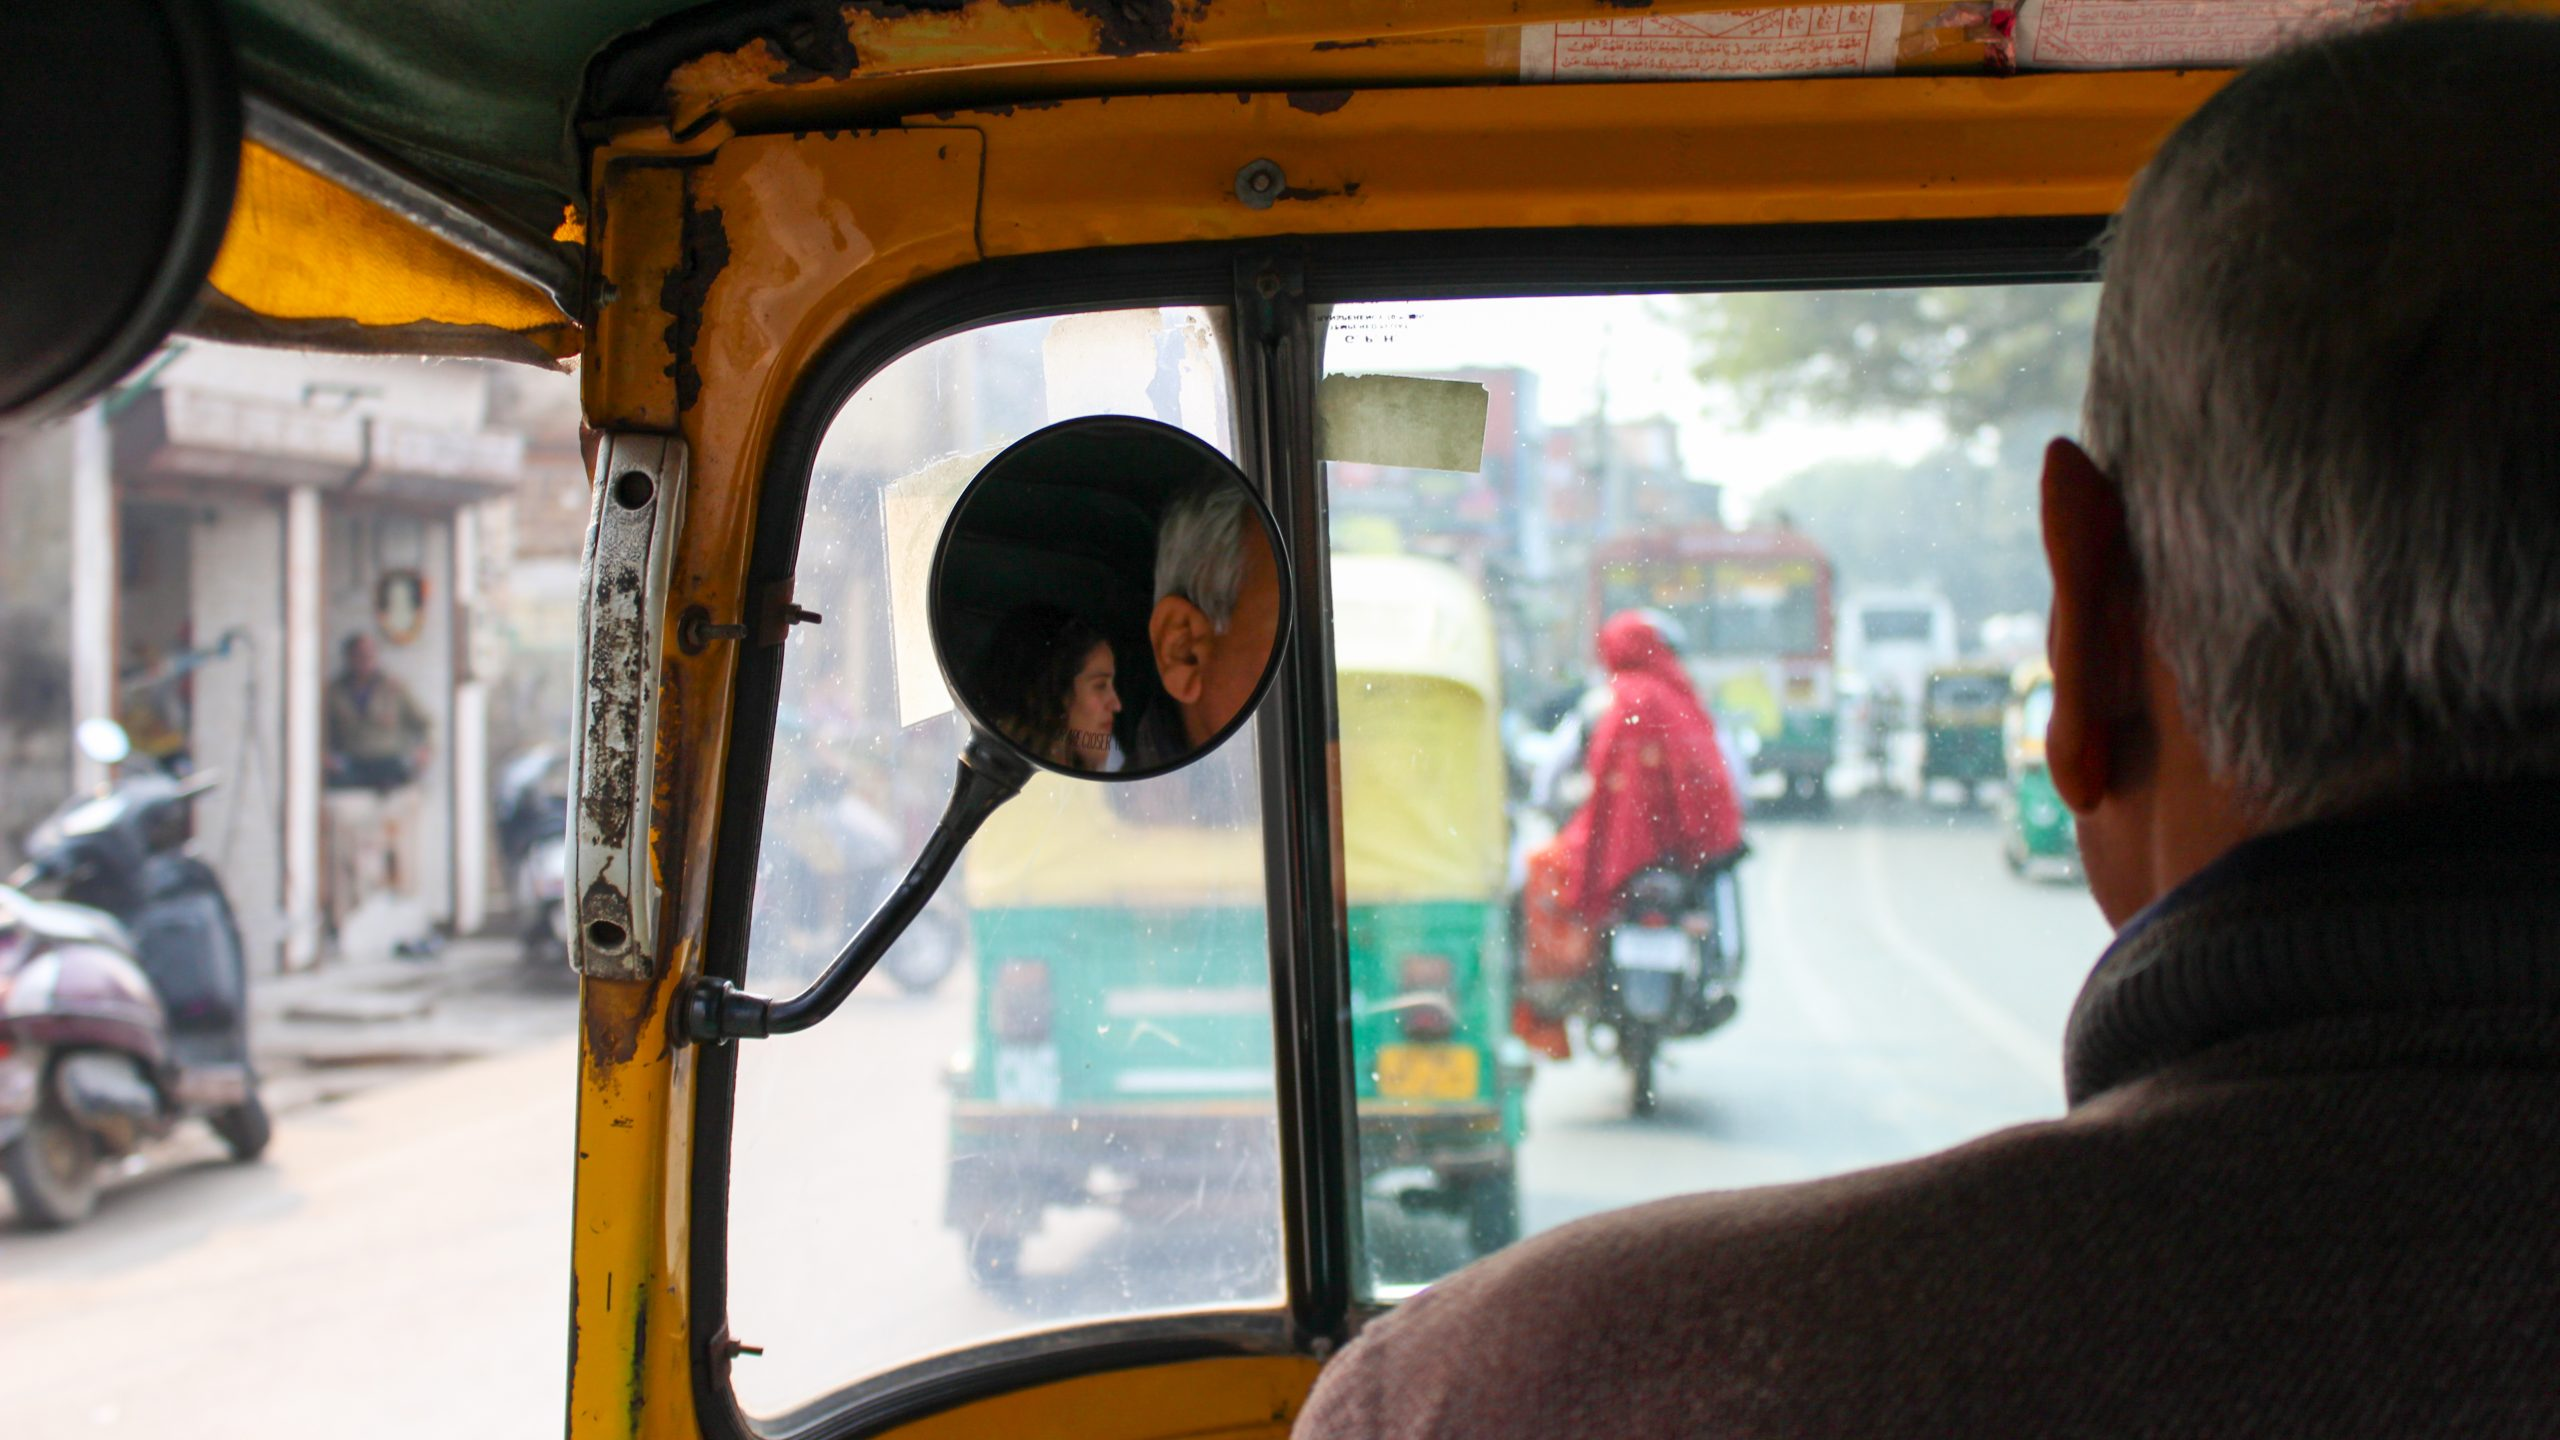 IMG 0266 scaled - Agra Bir Masal Anlat Bana